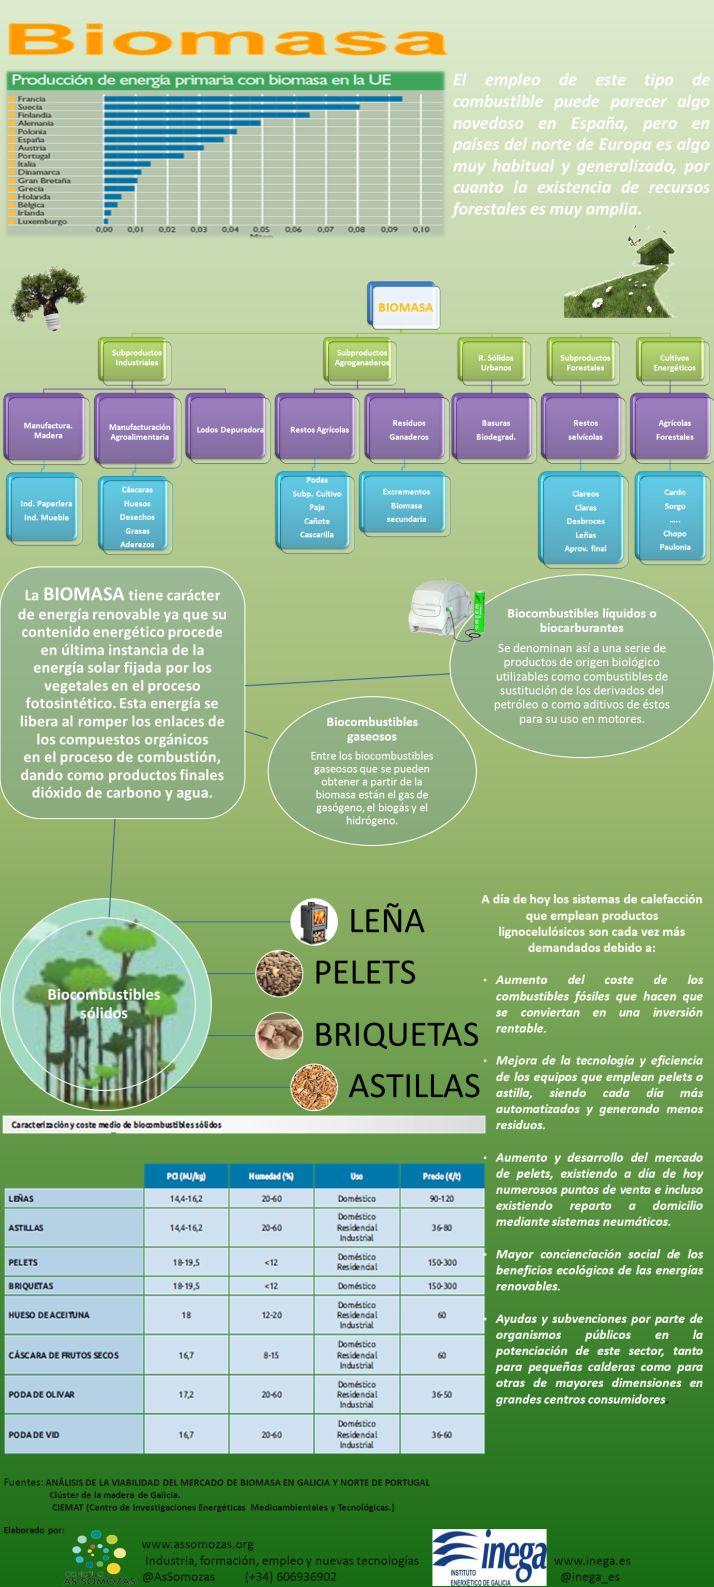 El mercado de la biomasa. Infografia.